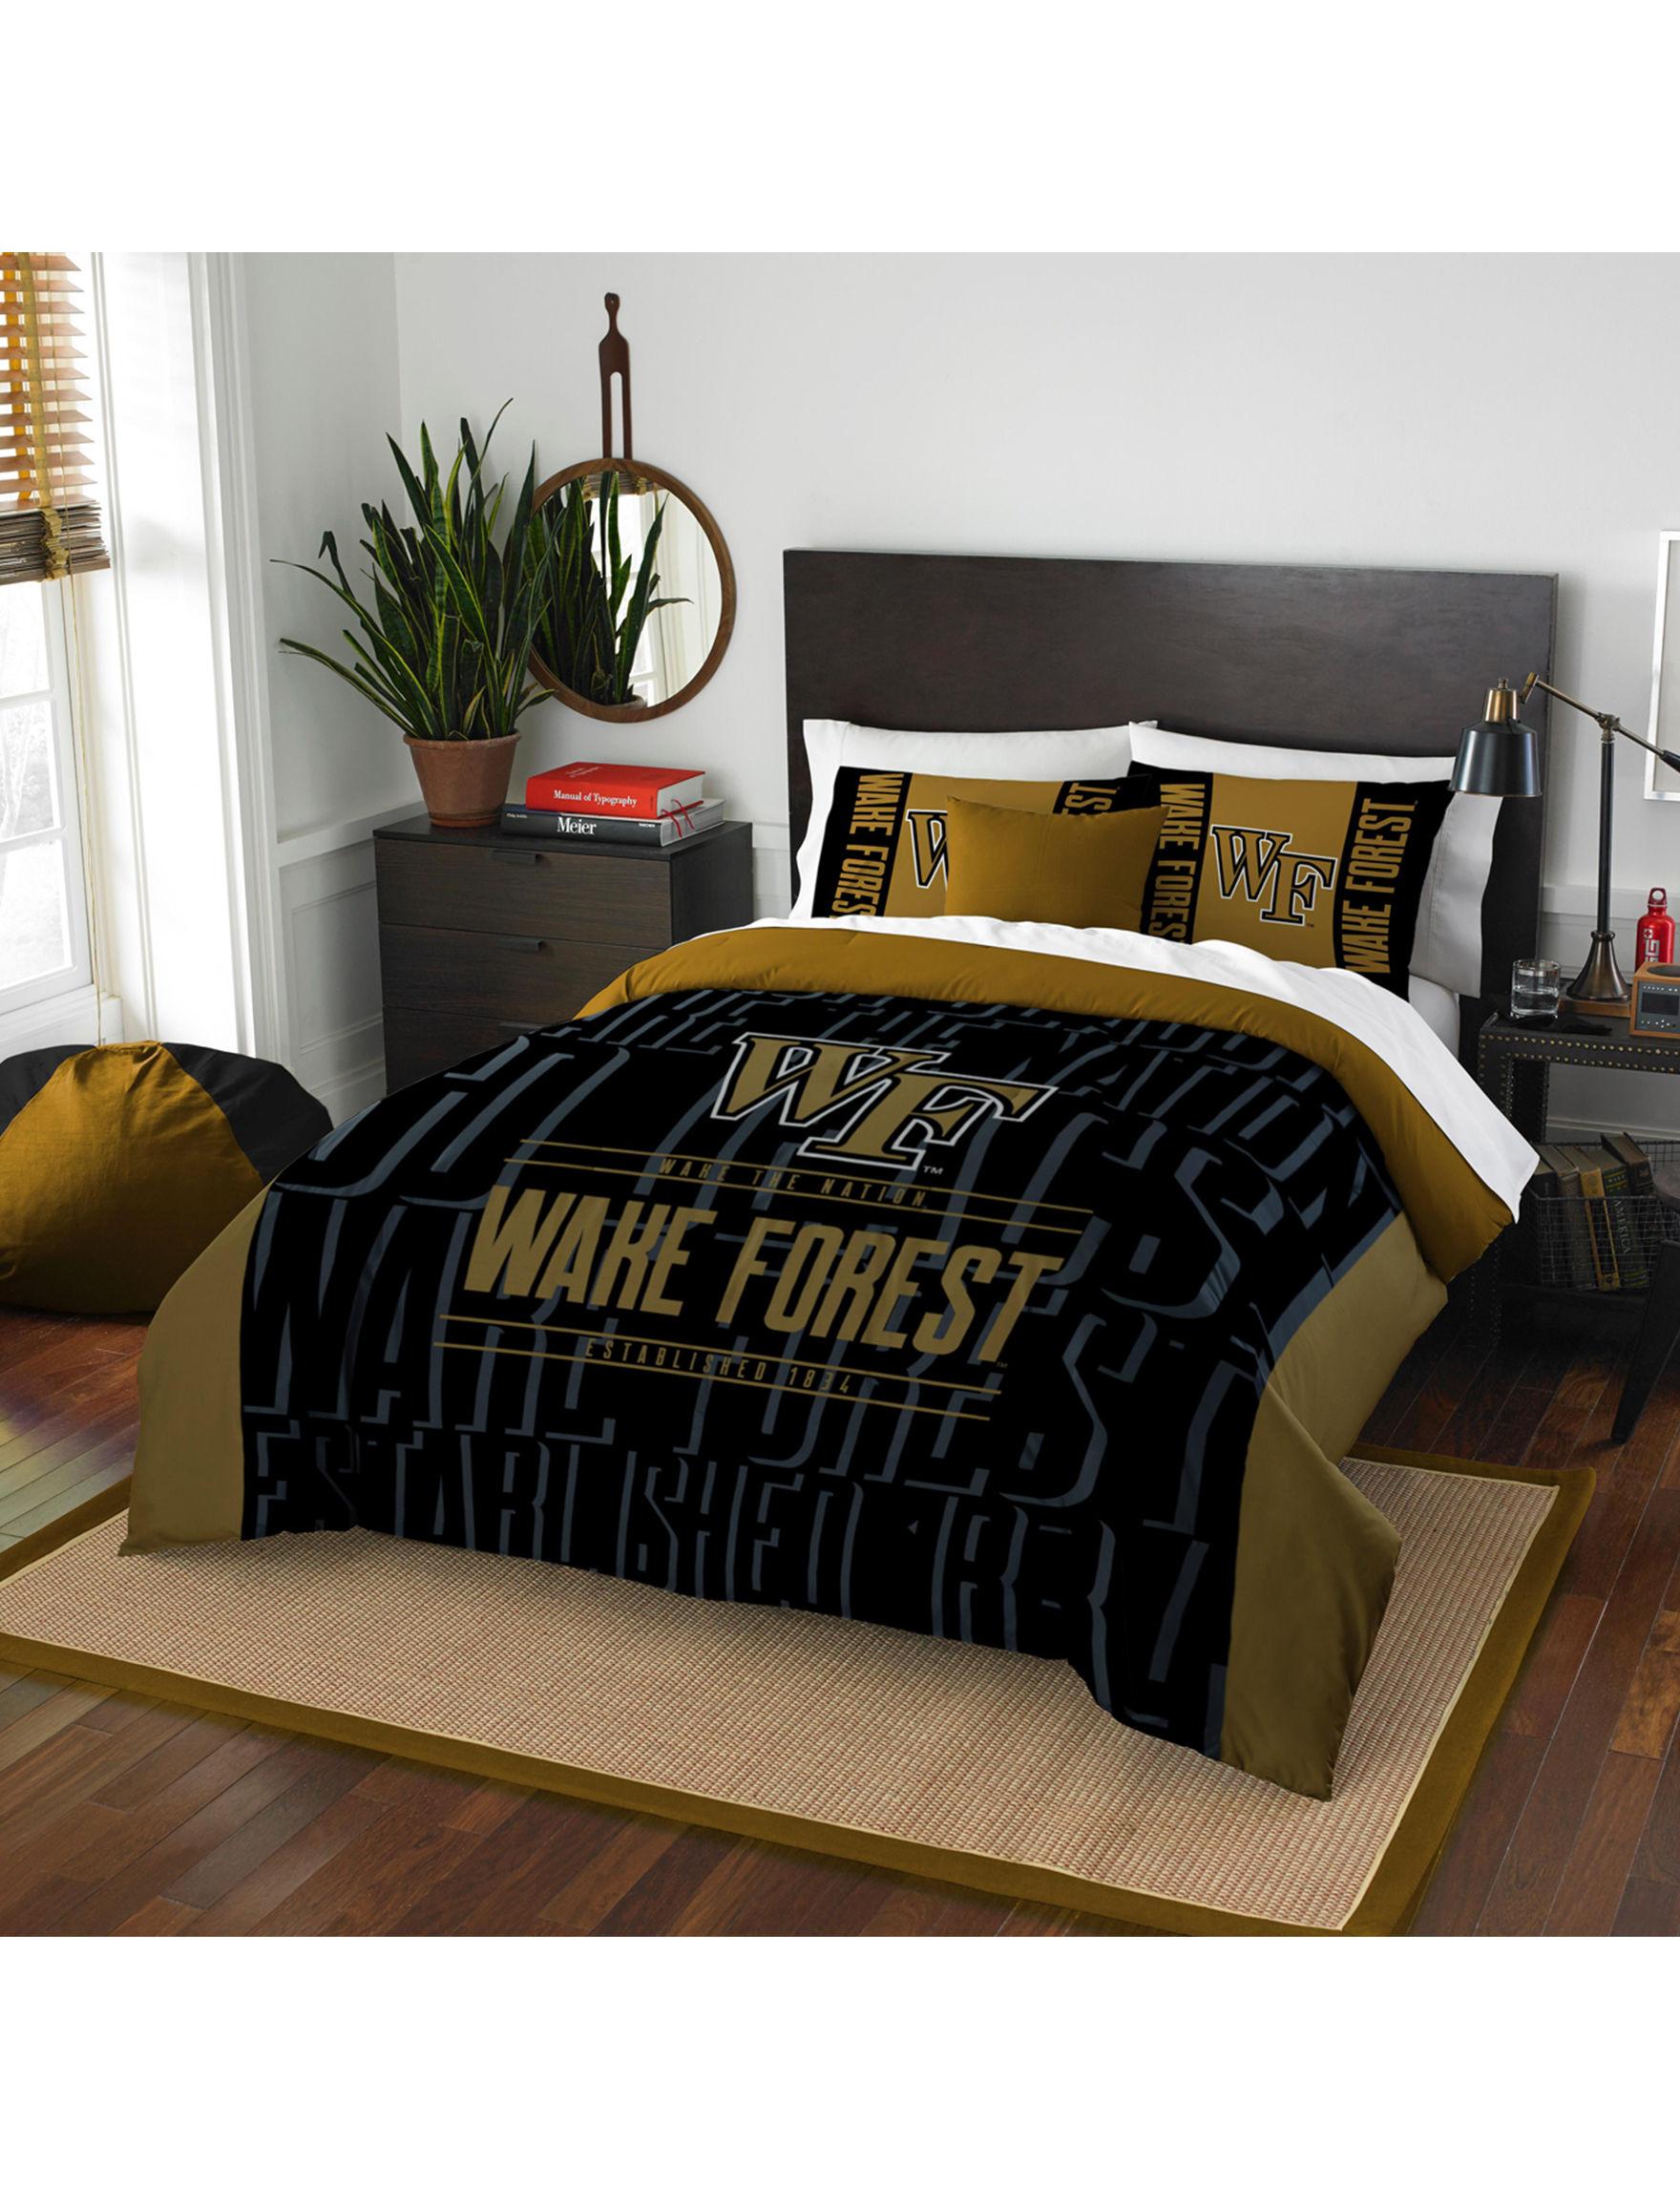 The Northwest Company Multi Comforters & Comforter Sets NCAA